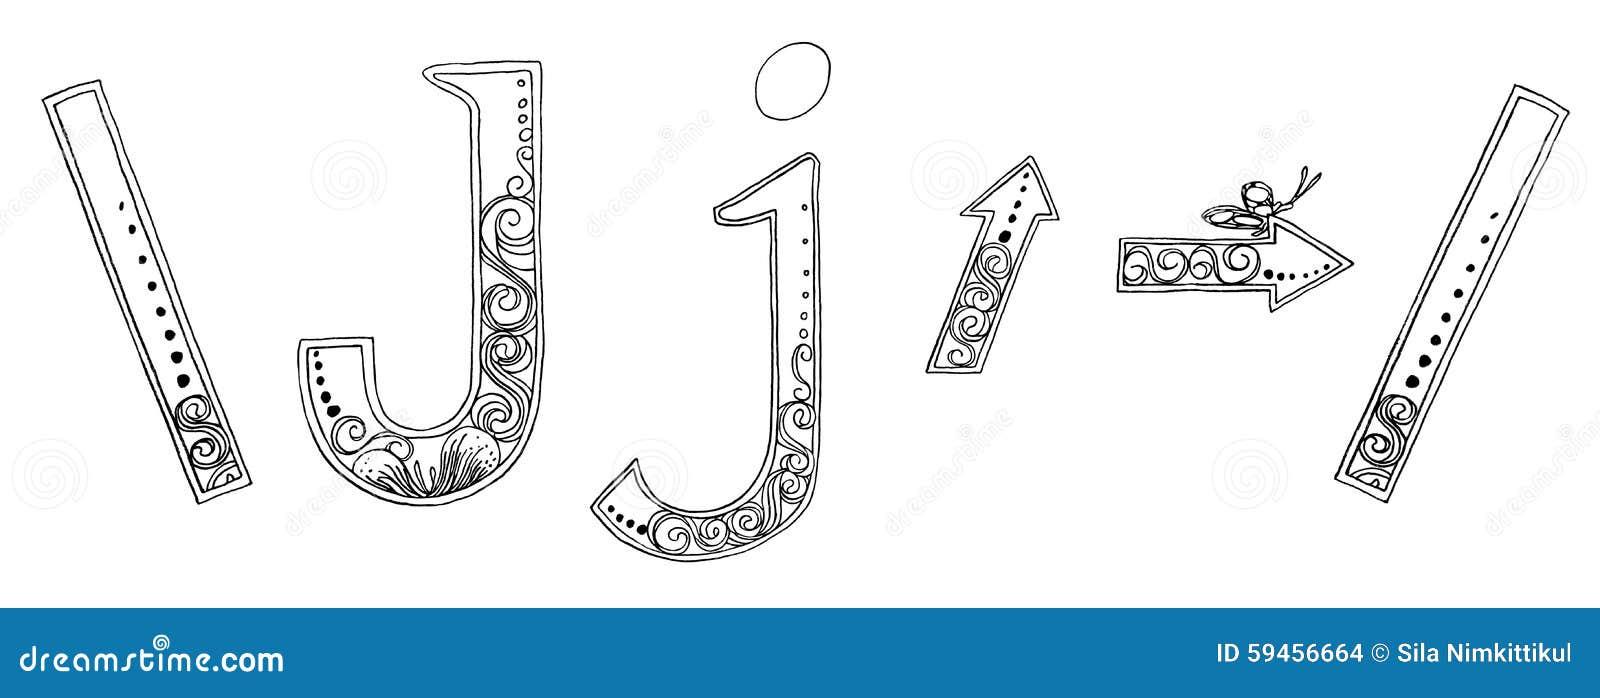 J Arrow Symbol Venda Freehand Pencil Sketch Font Stock Illustration